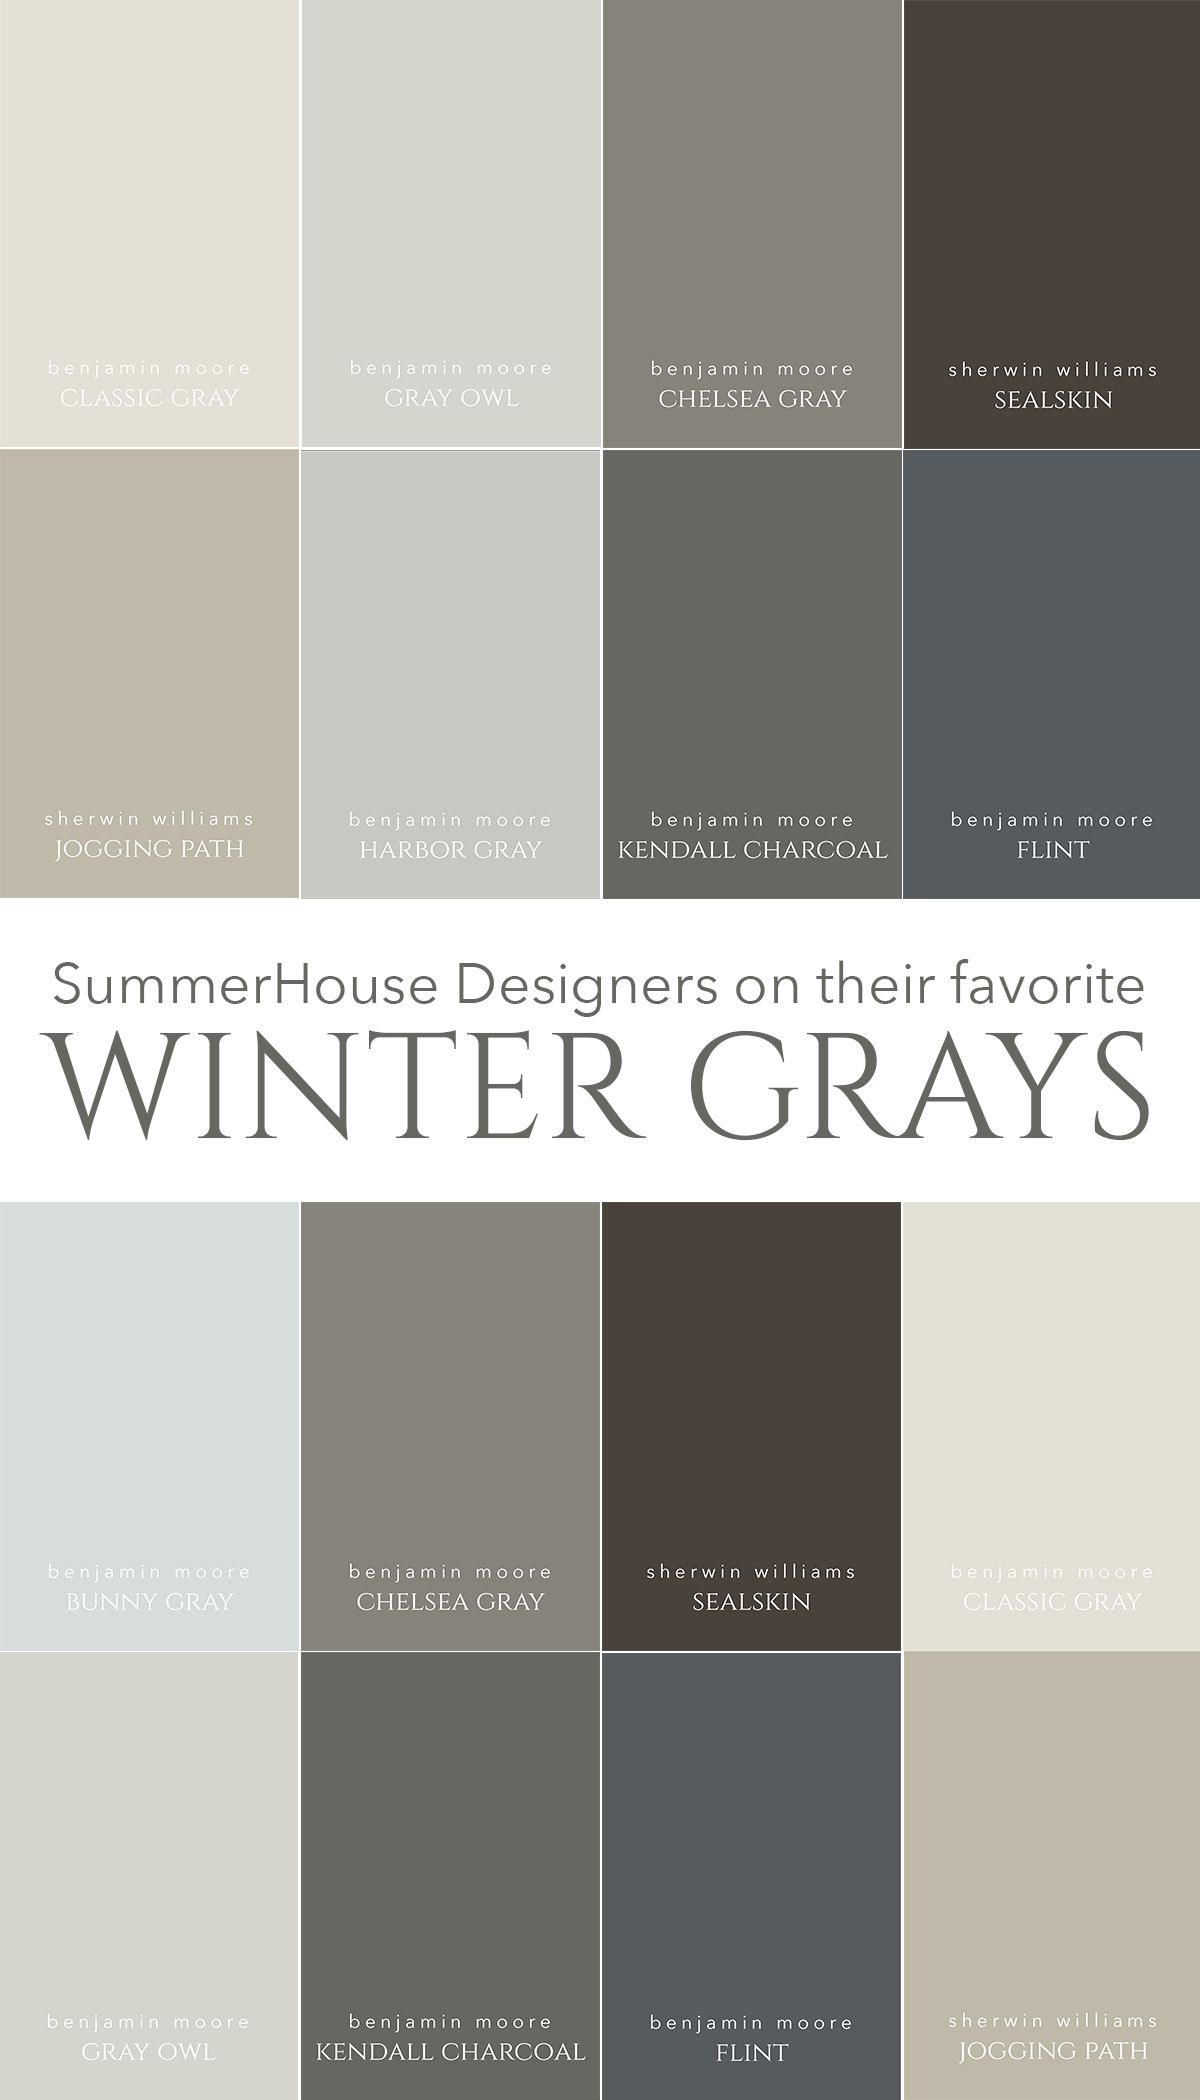 SummerHouse Interior Designersu0027 Favorite Winter Inspired Gray Paint Colors  // Www.alwayssummerblog.com